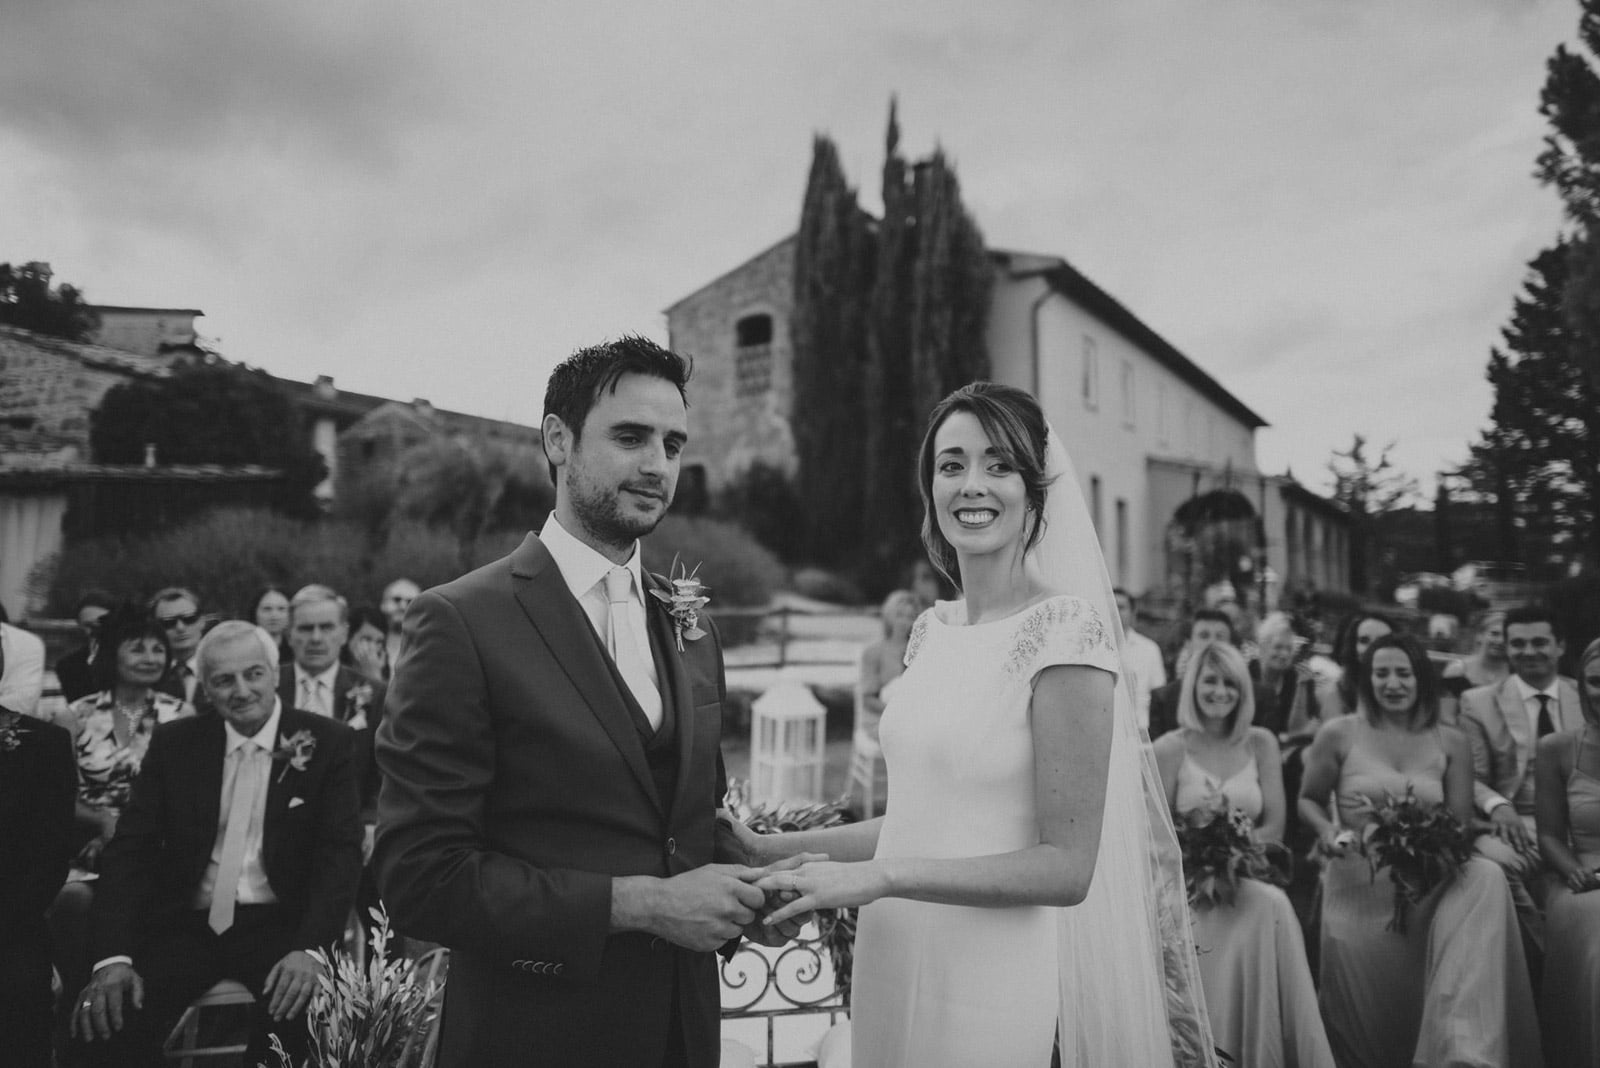 059-wedding-tuscany-san-galgano-federico-pannacci-photographer